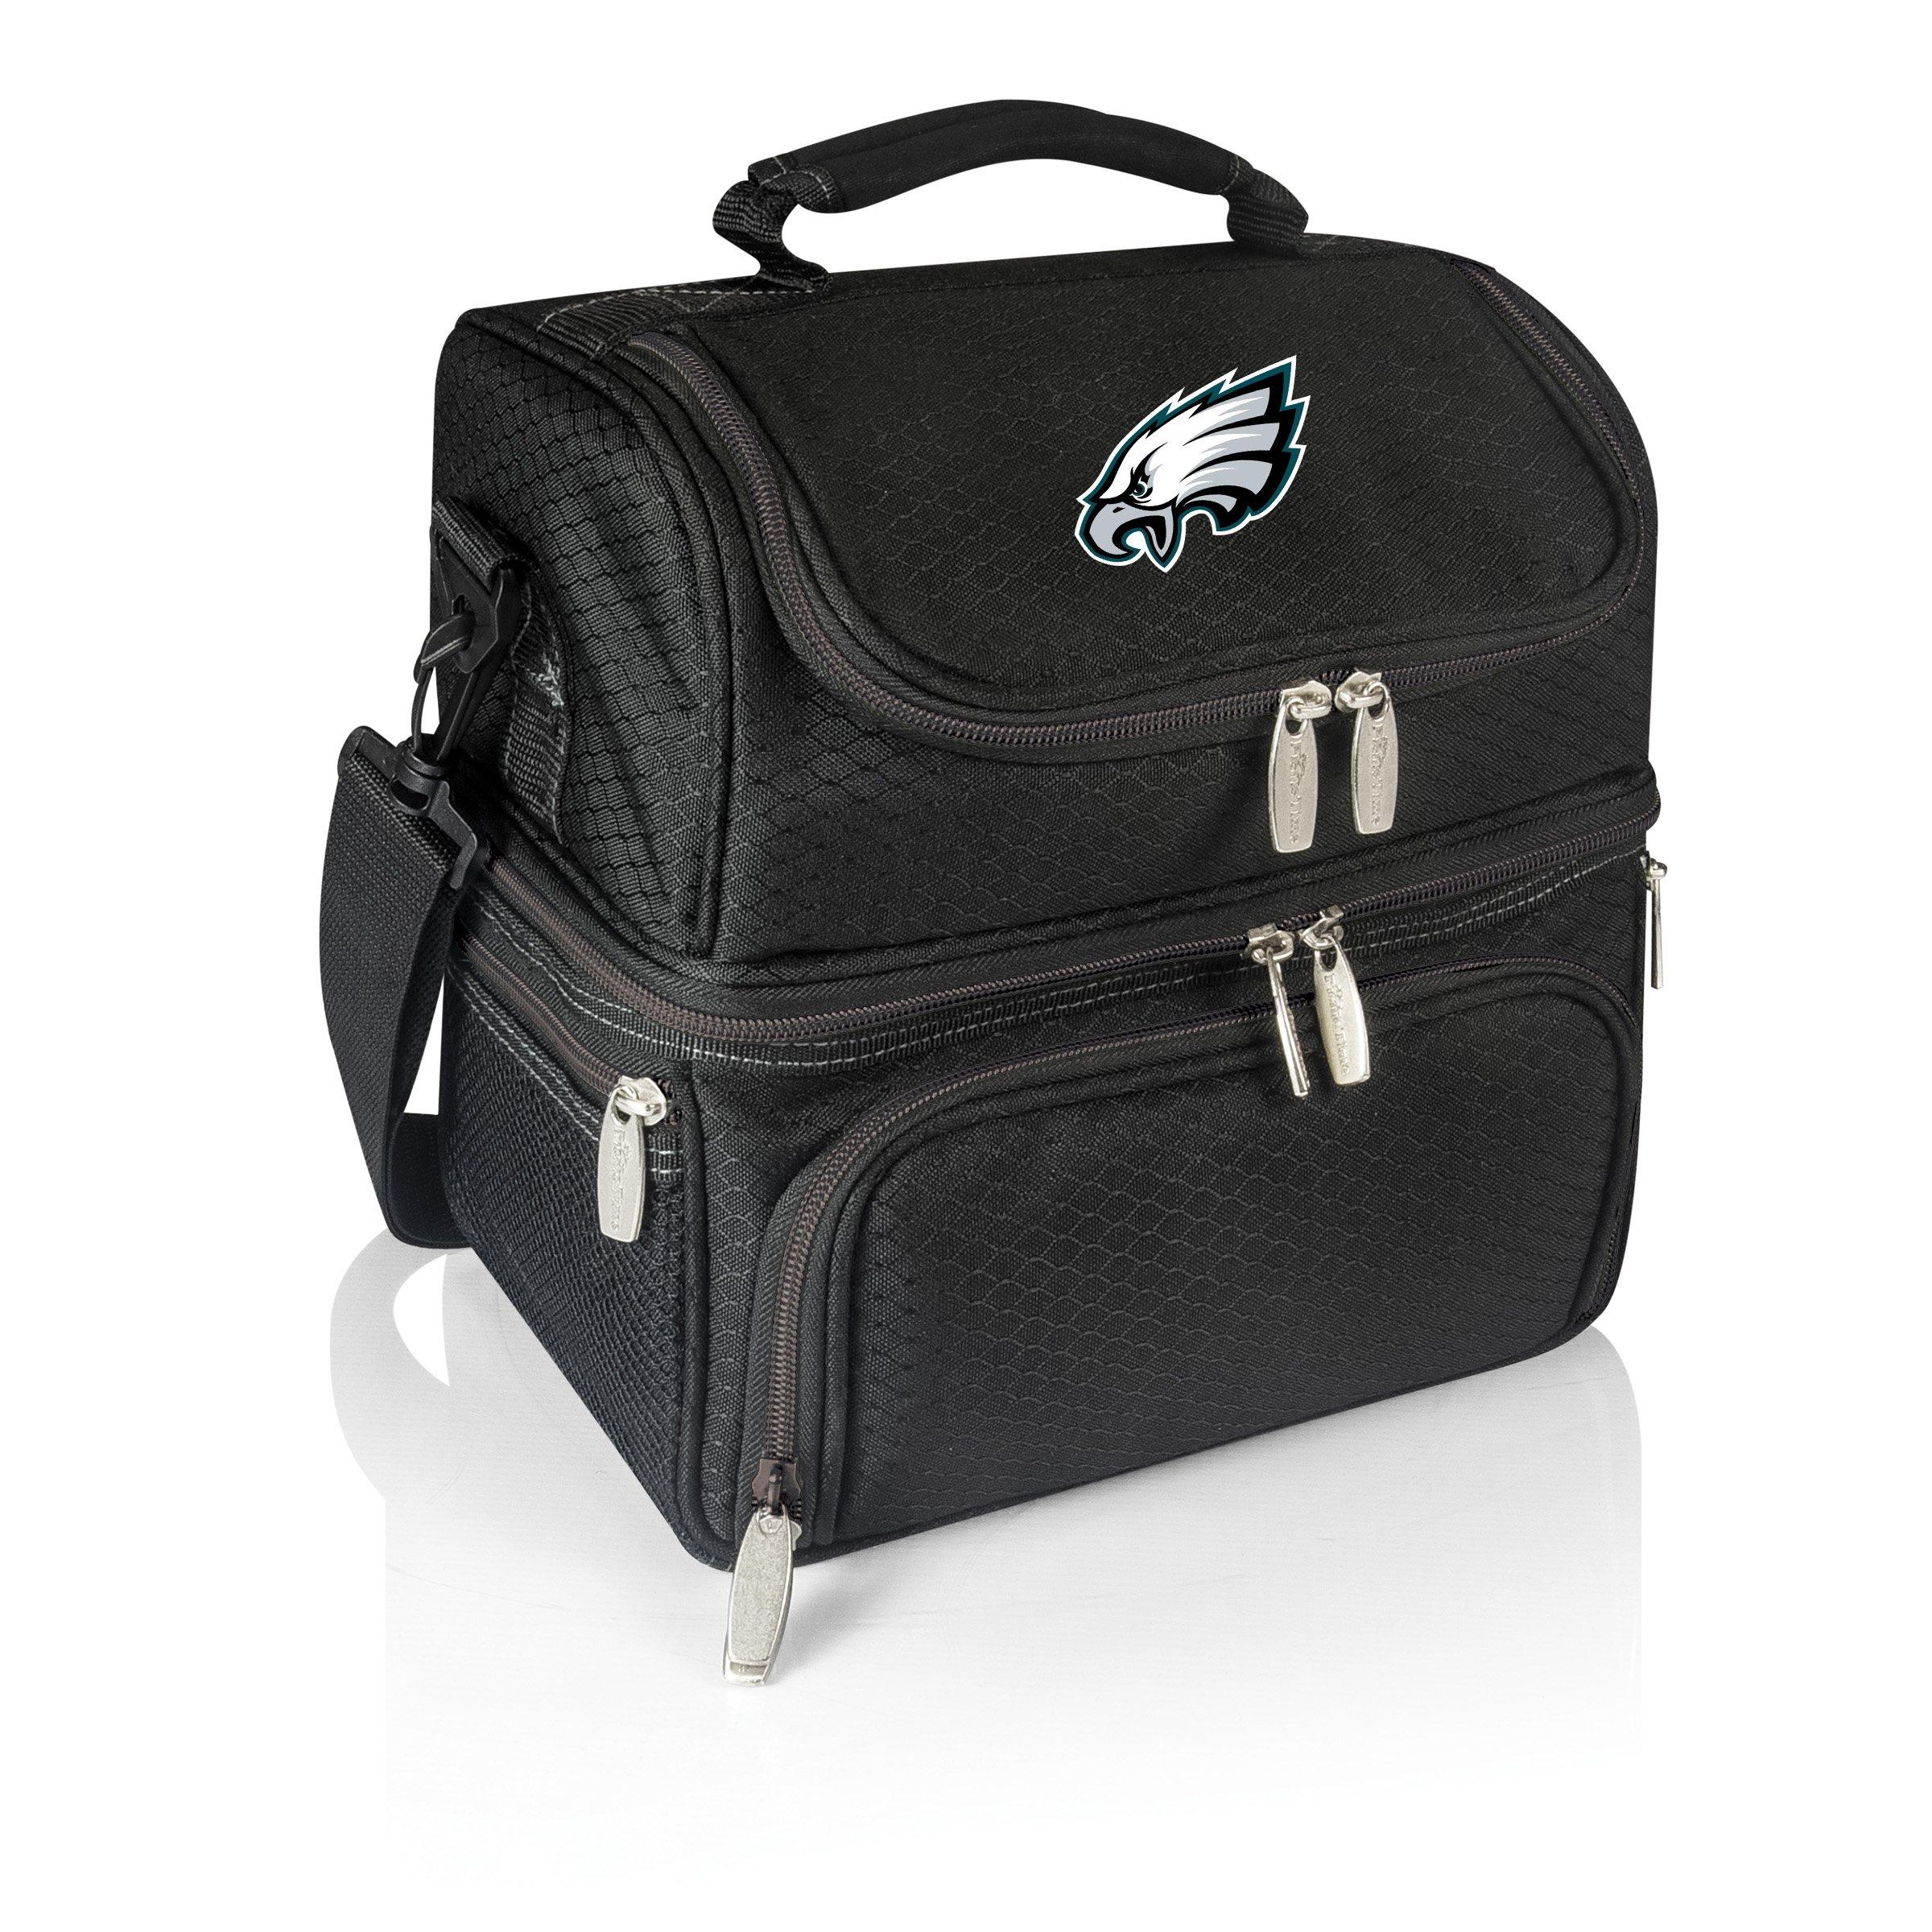 PICNIC TIME NFL Philadelphia Eagles Digital Print Pranzo Personal Cooler, One Size, Black